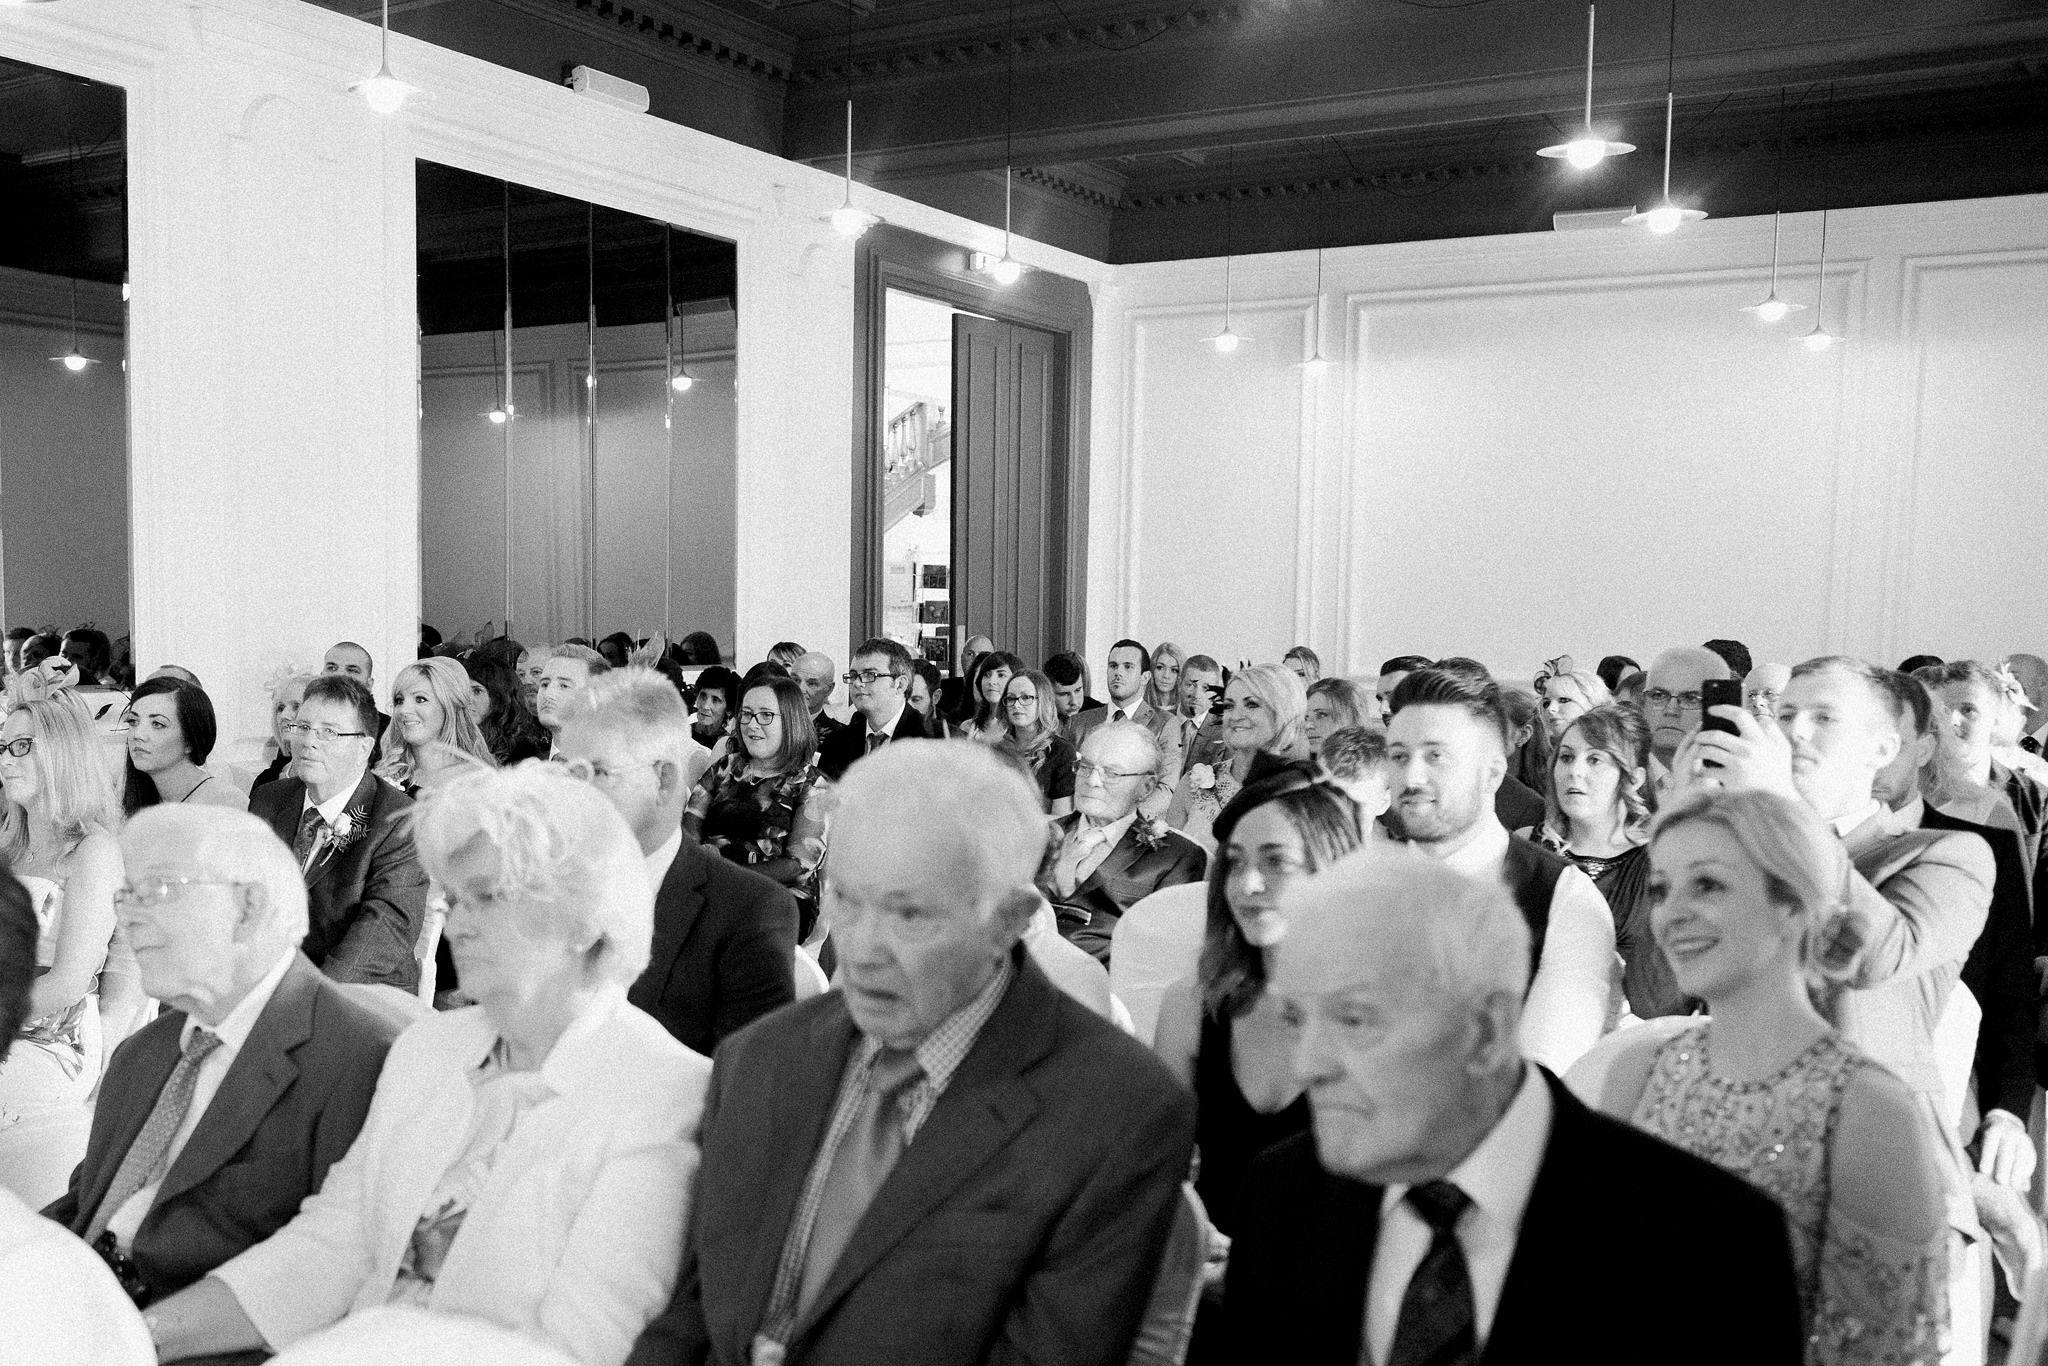 072-wedding-photography-peebles.jpg